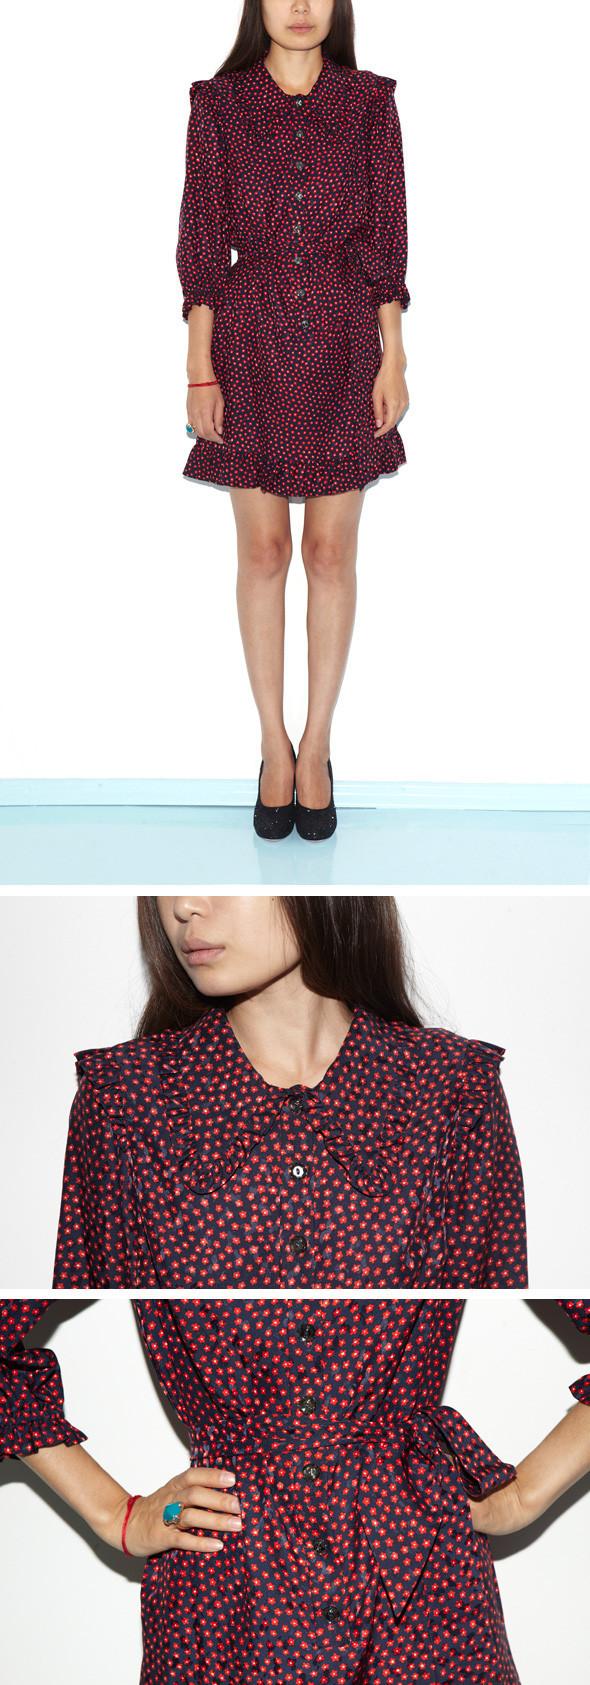 Гардероб: Джига Санжиева, младший редактор моды журнала In Style. Изображение № 1.